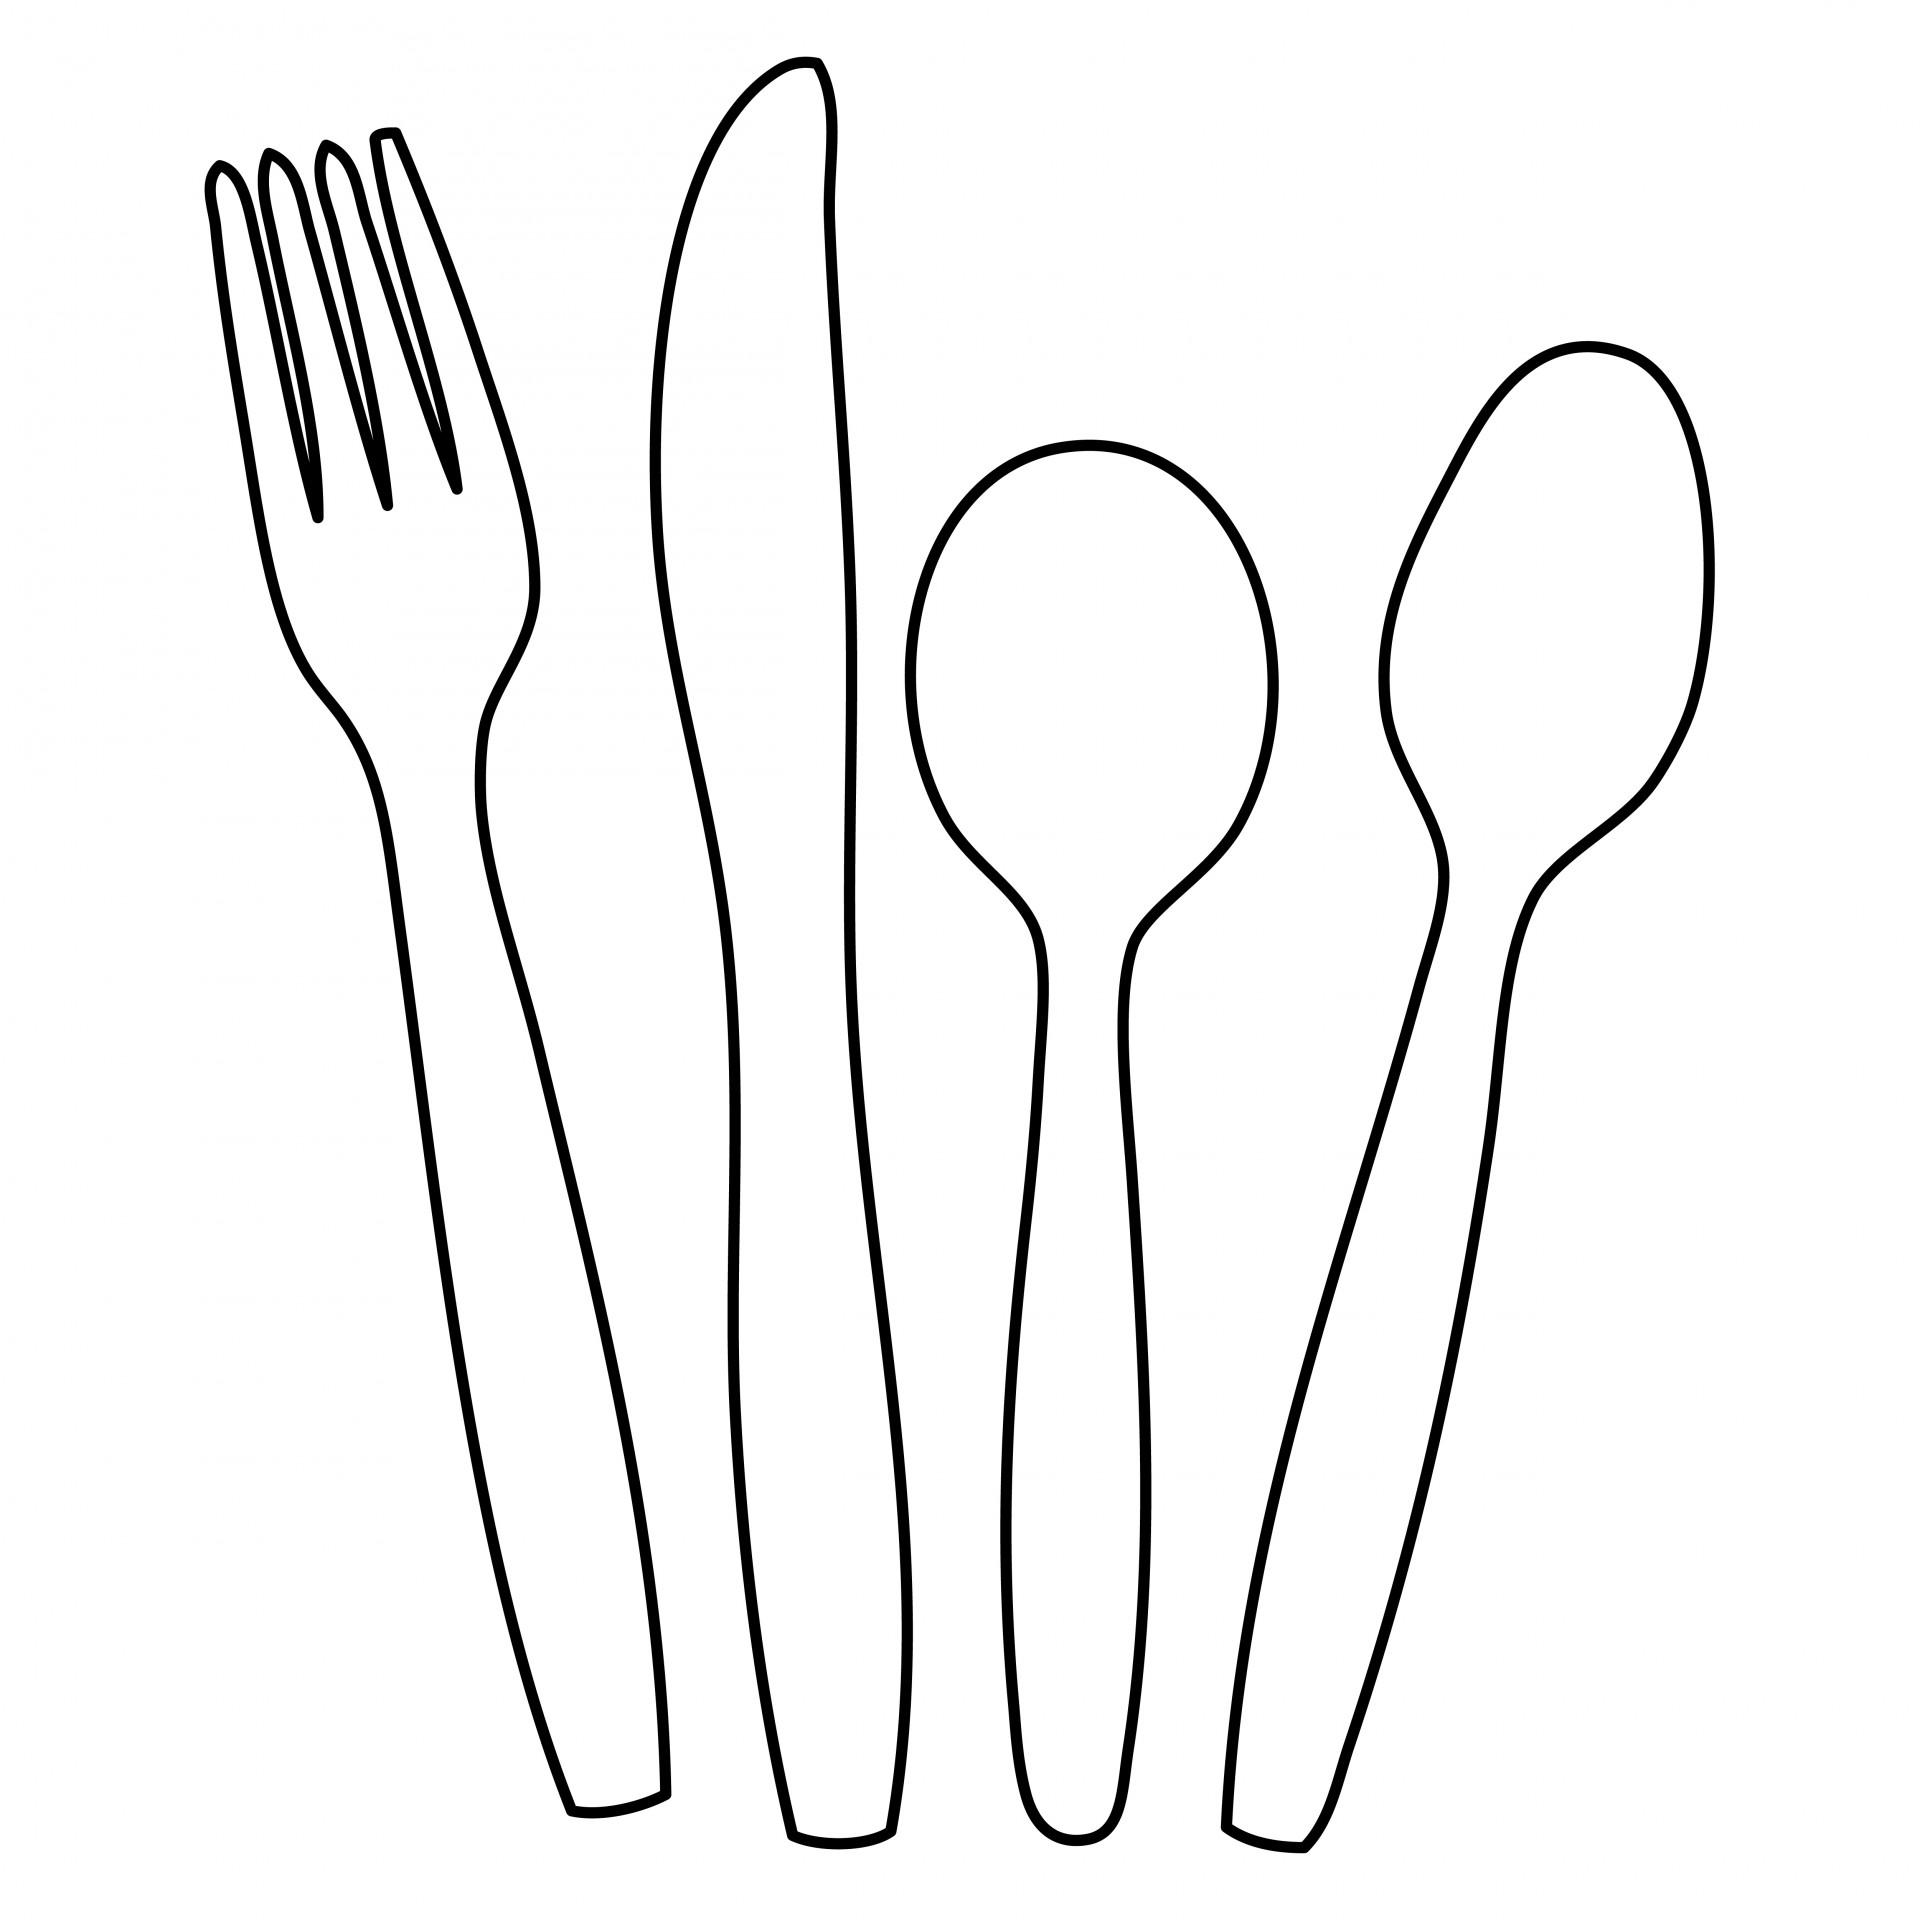 Cutlery,knife,fork,spoon,outline.